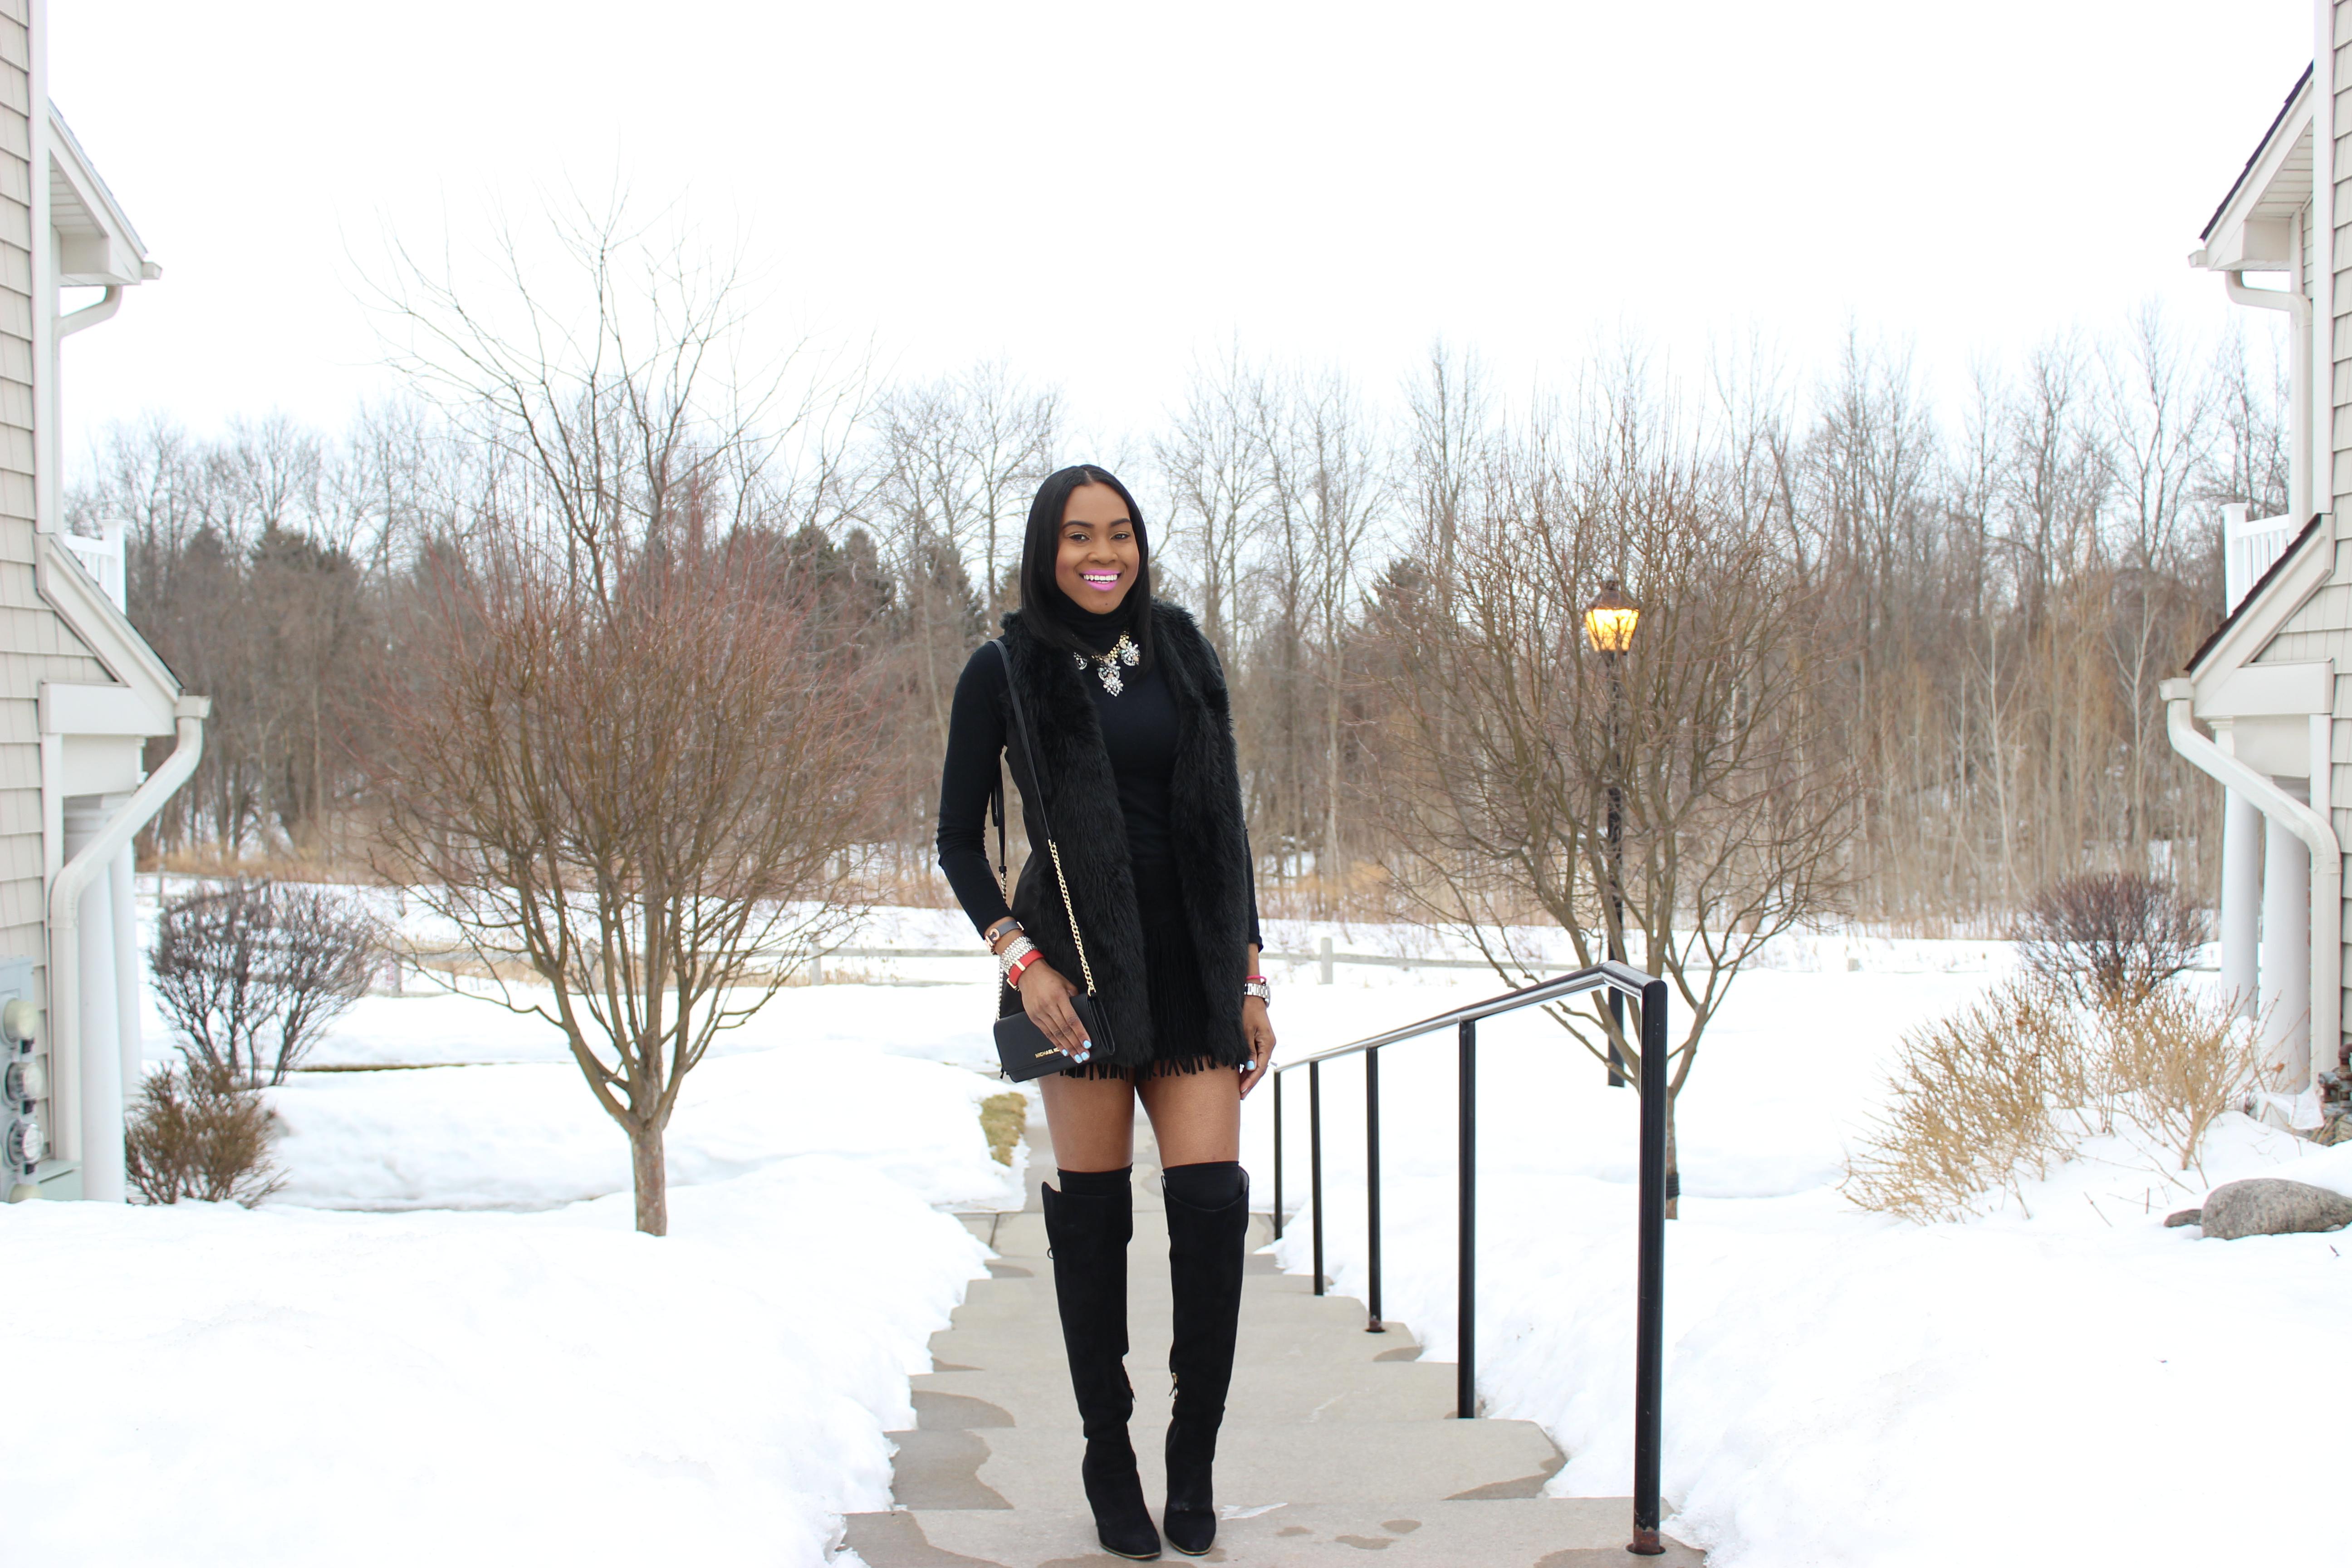 Style-Files-Suede-Fringe-hem-skirt-black-turtleneck-BCBG-Max-Azria- Leather-Sleeve-blazer-Sam-libby-knee-high-boots-Mossimo-faux-fur-vest-5